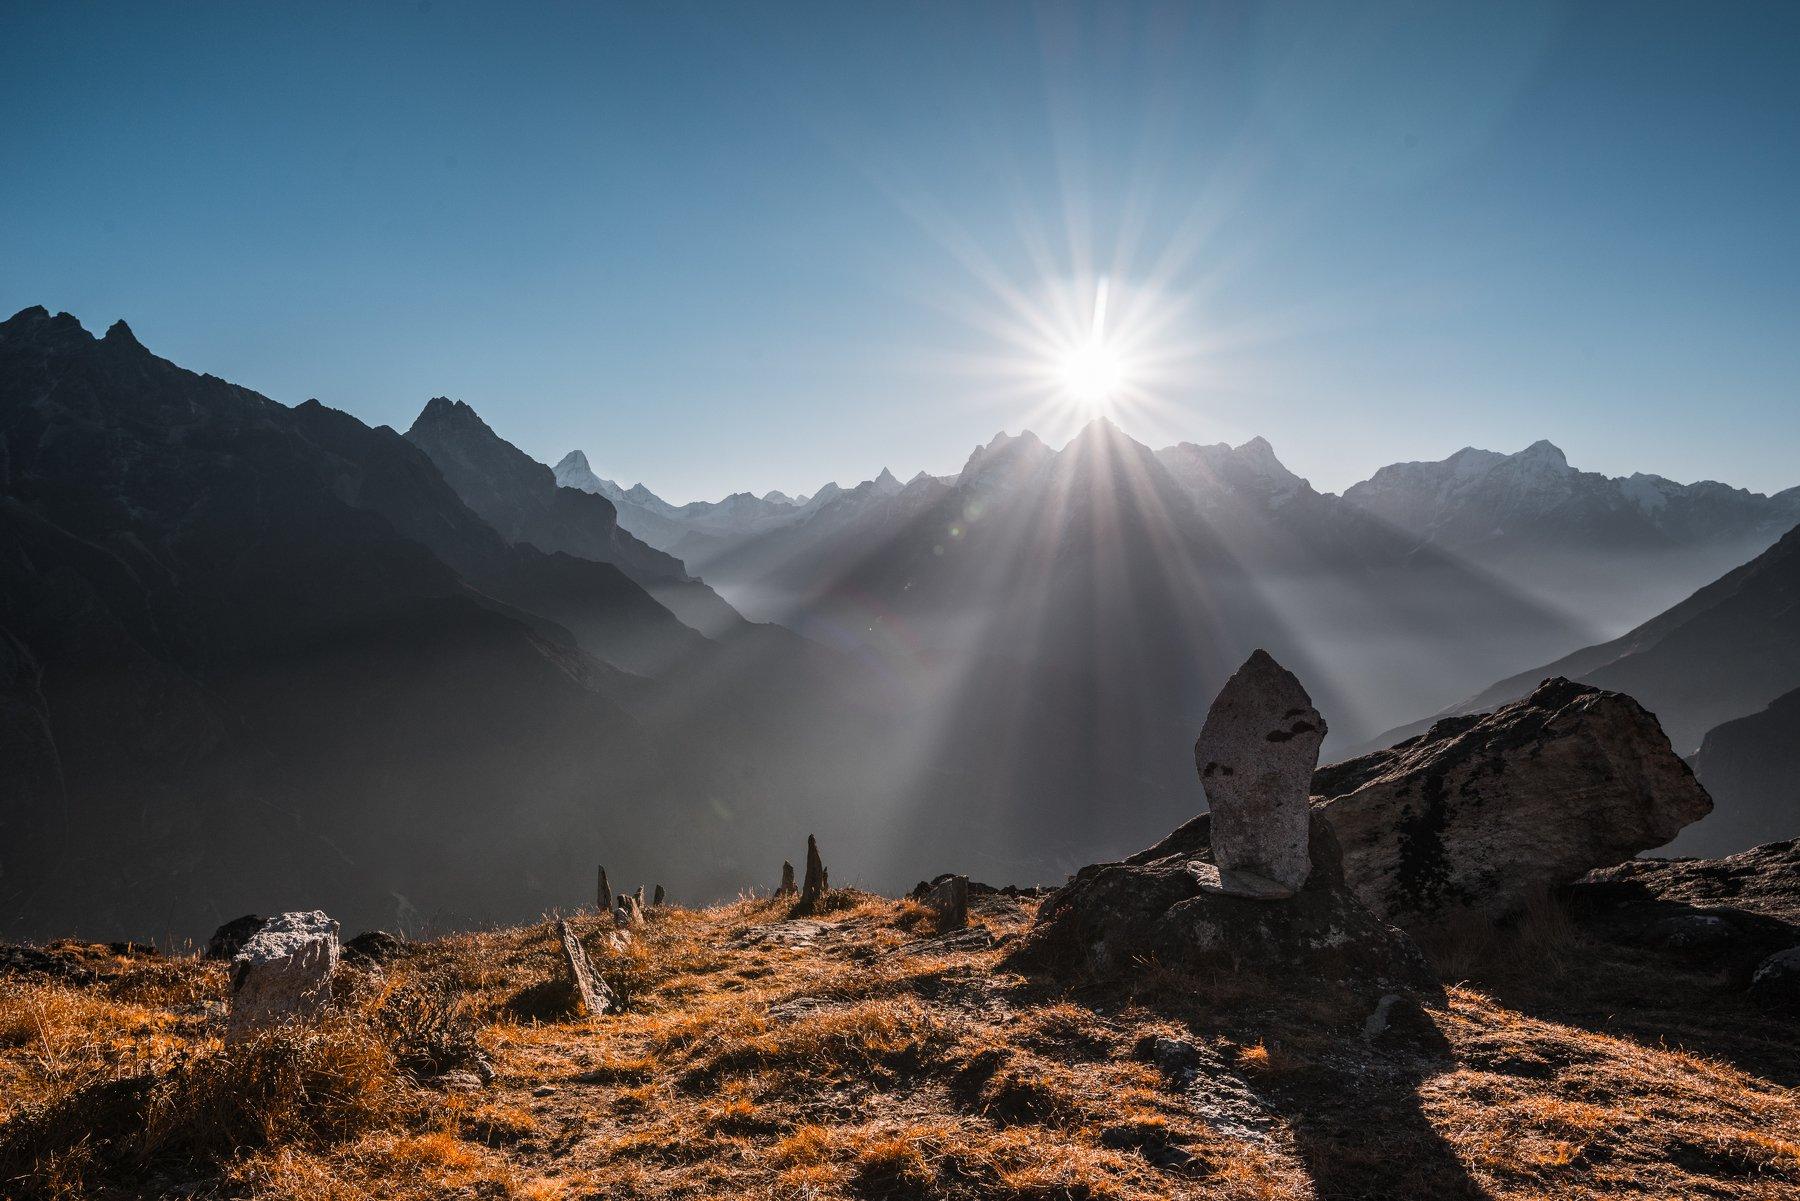 Непал, Гималаи, утро, солнце, Evgeniy Khilkevitch